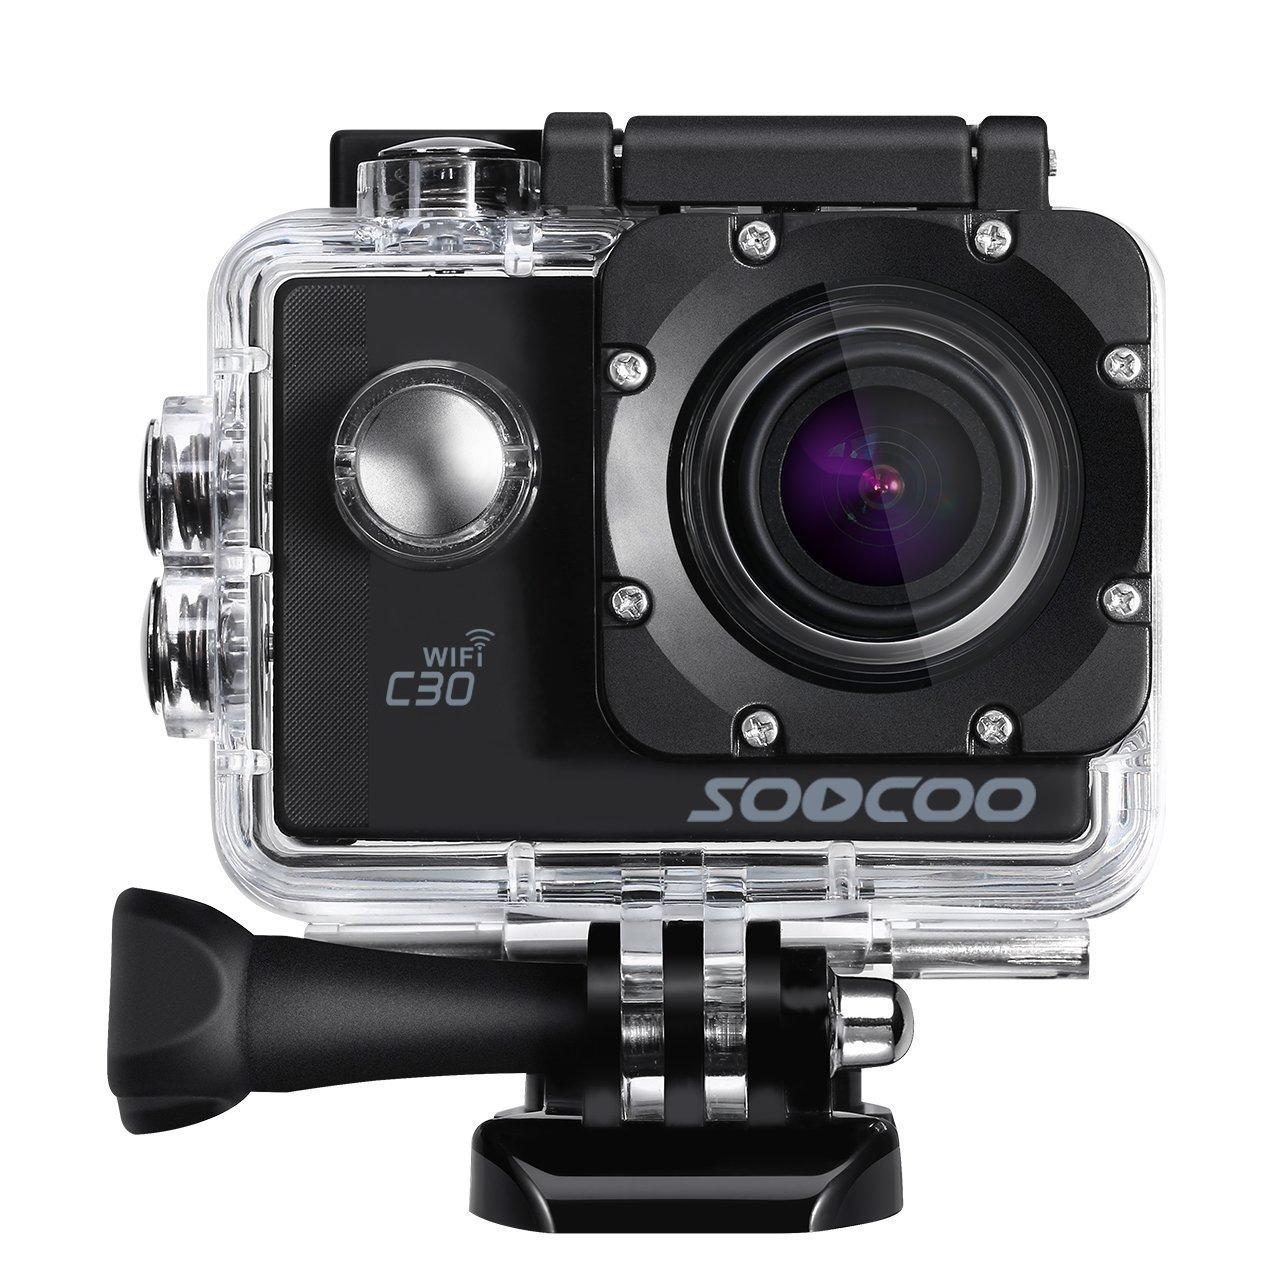 Opta SAC-003, Mini Sports Action Camera With Wifi - 4K 1080P Full Hd, G Sensor, Hdmi Hd Output- (Black Color, 12 Accessories)